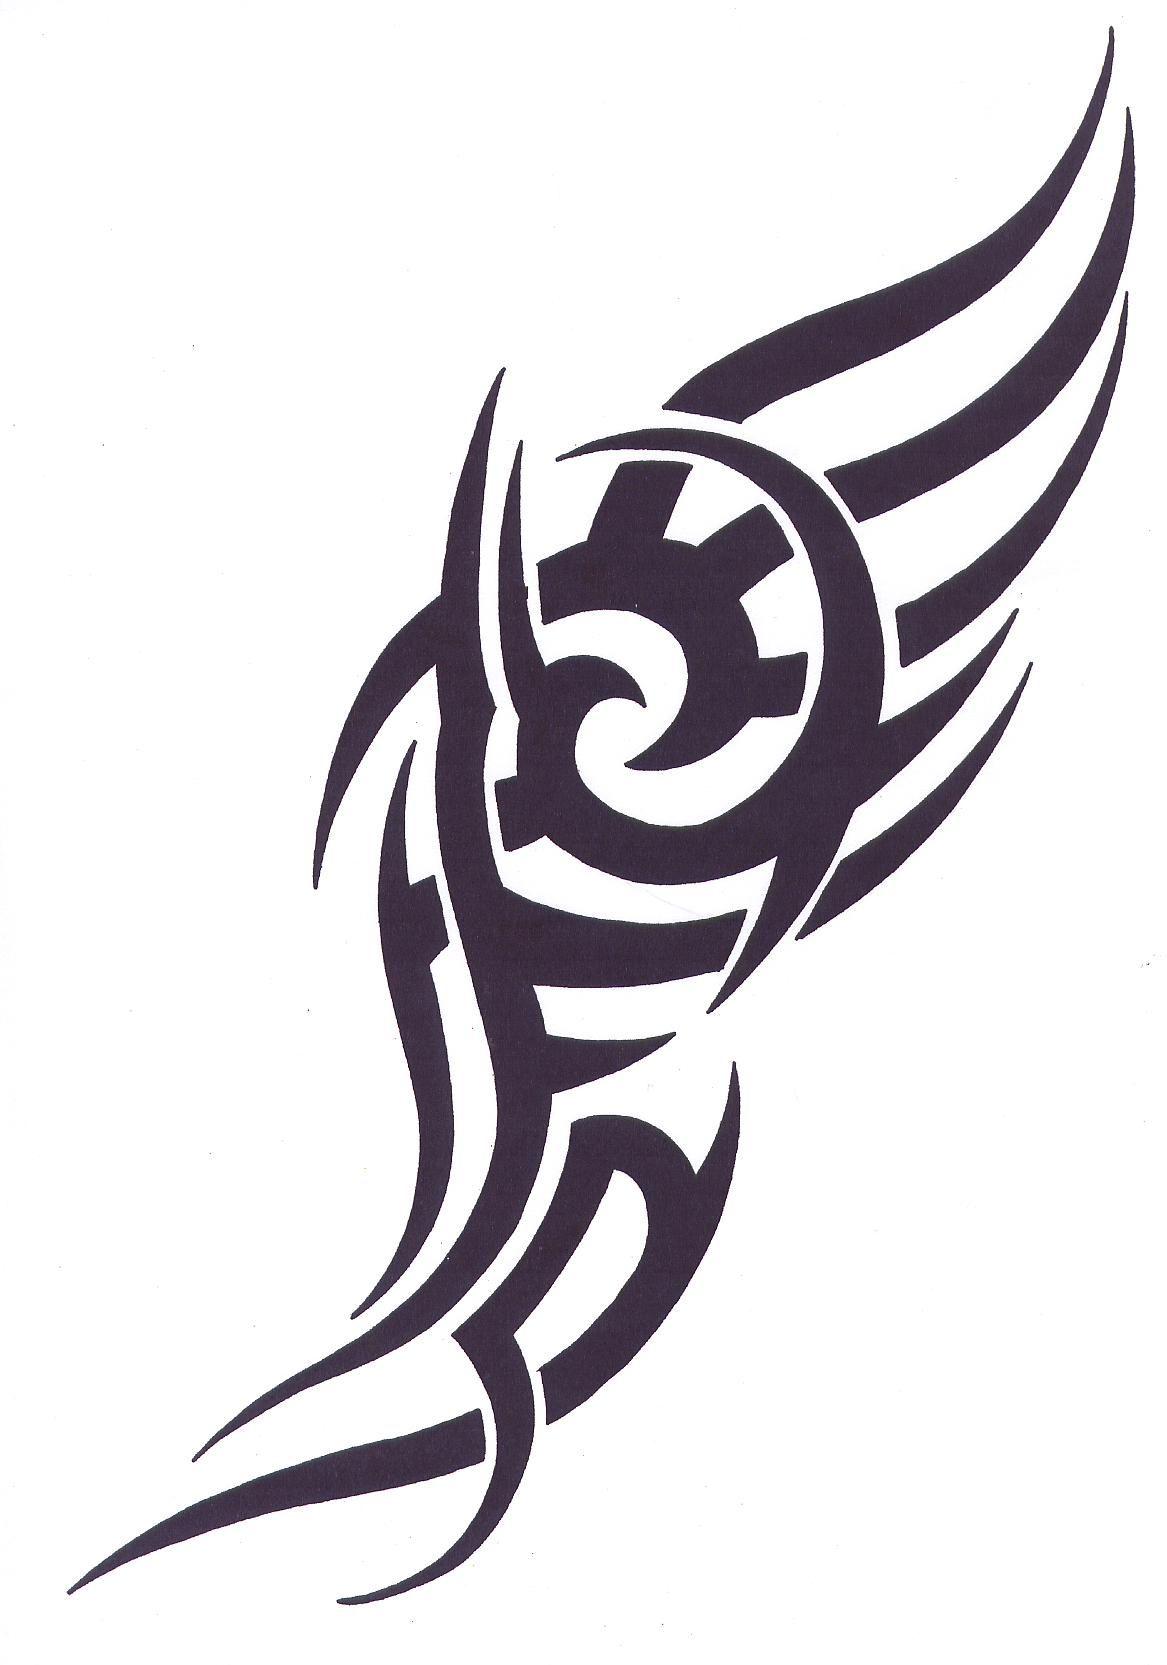 Bullseye Tattoos Offers Thousands Of Top Quality Tattoo Designs Tattoo Ideas Small Tribal Tattoos Tribal Tattoo Designs Simple Tribal Tattoos